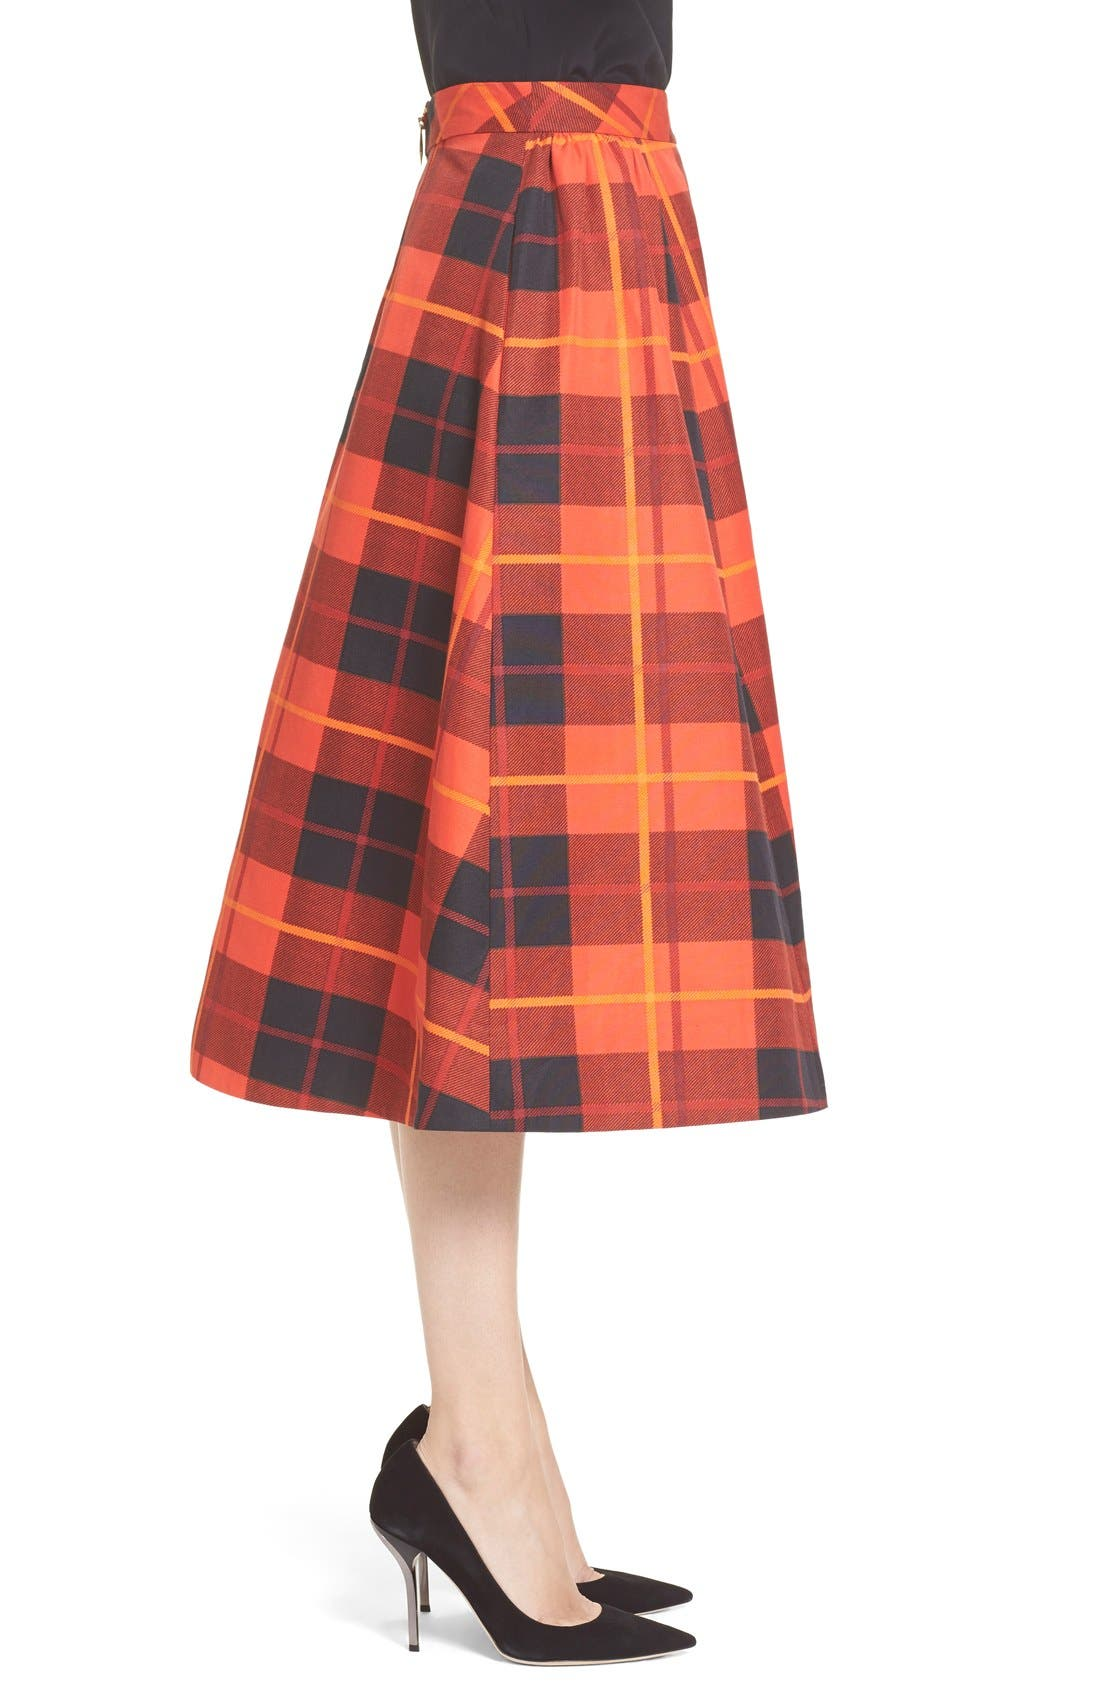 KATE SPADE NEW YORK,                             katespade new yorkwoodland plaid midi skirt,                             Alternate thumbnail 4, color,                             601